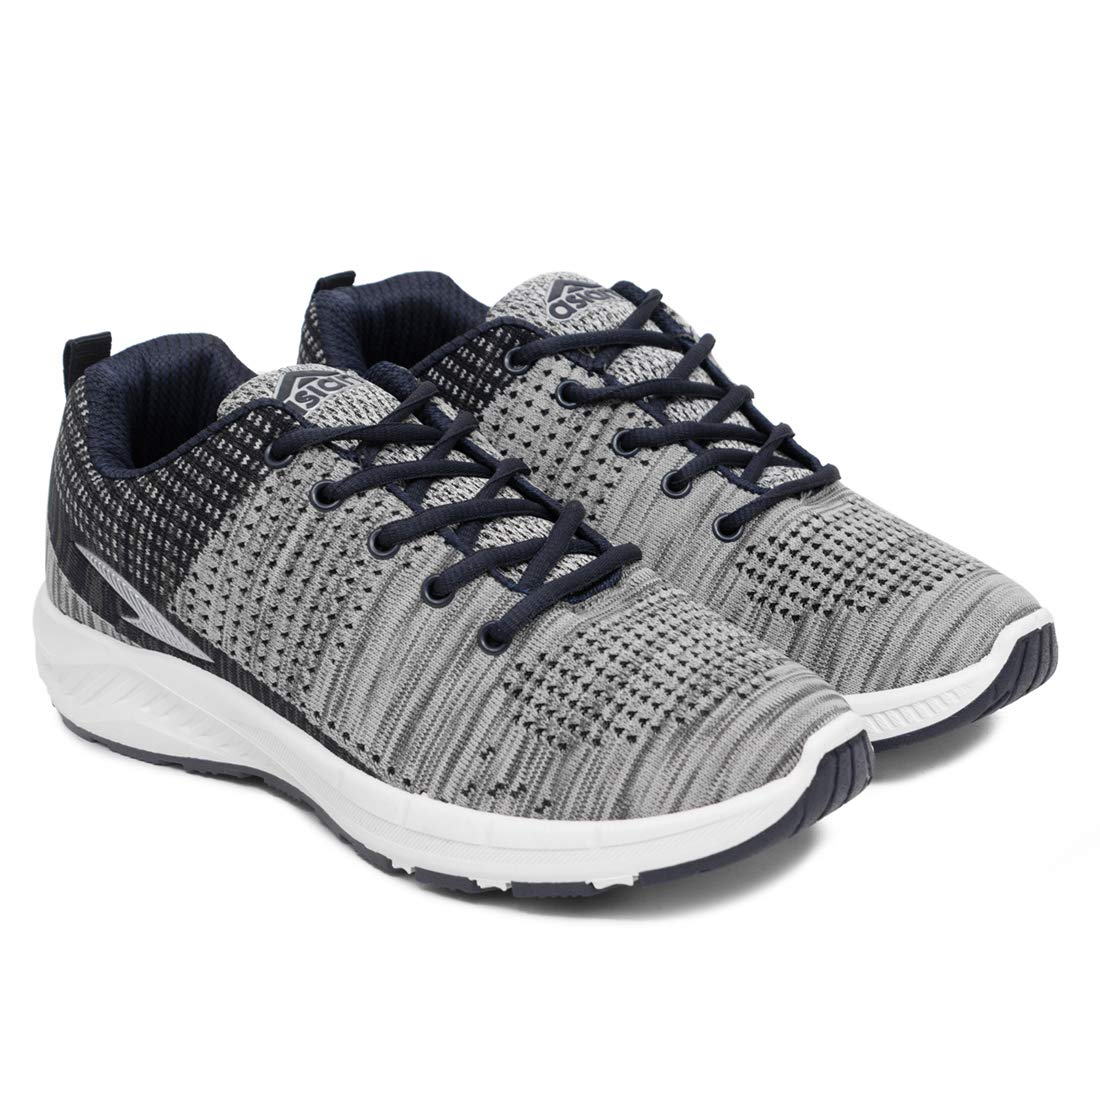 Running \u0026 Walking Shoes